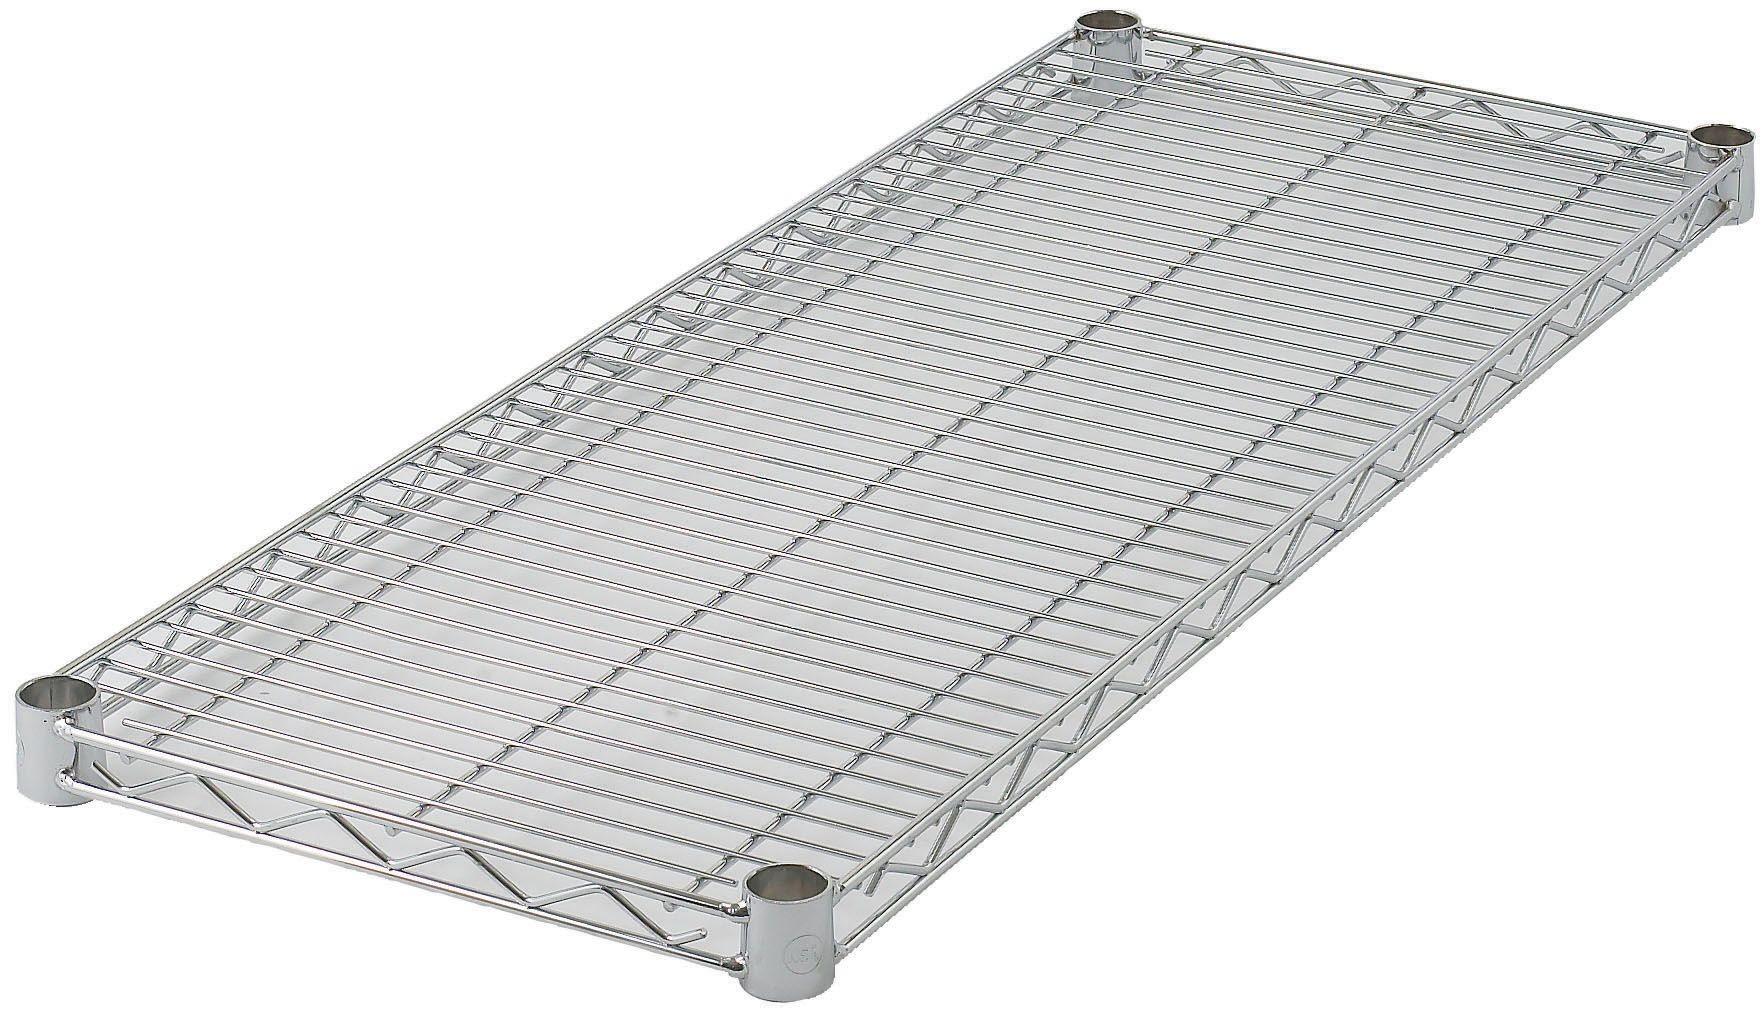 "Winco VC-1424 Chrome-Plated Wire Shelf 14"" x 24"""